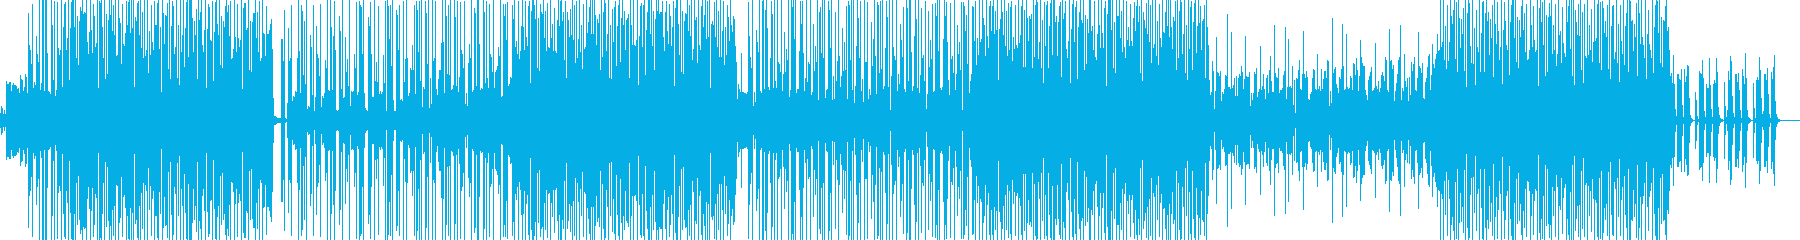 HIPHOPトラック ノリノリ系の再生済みの波形